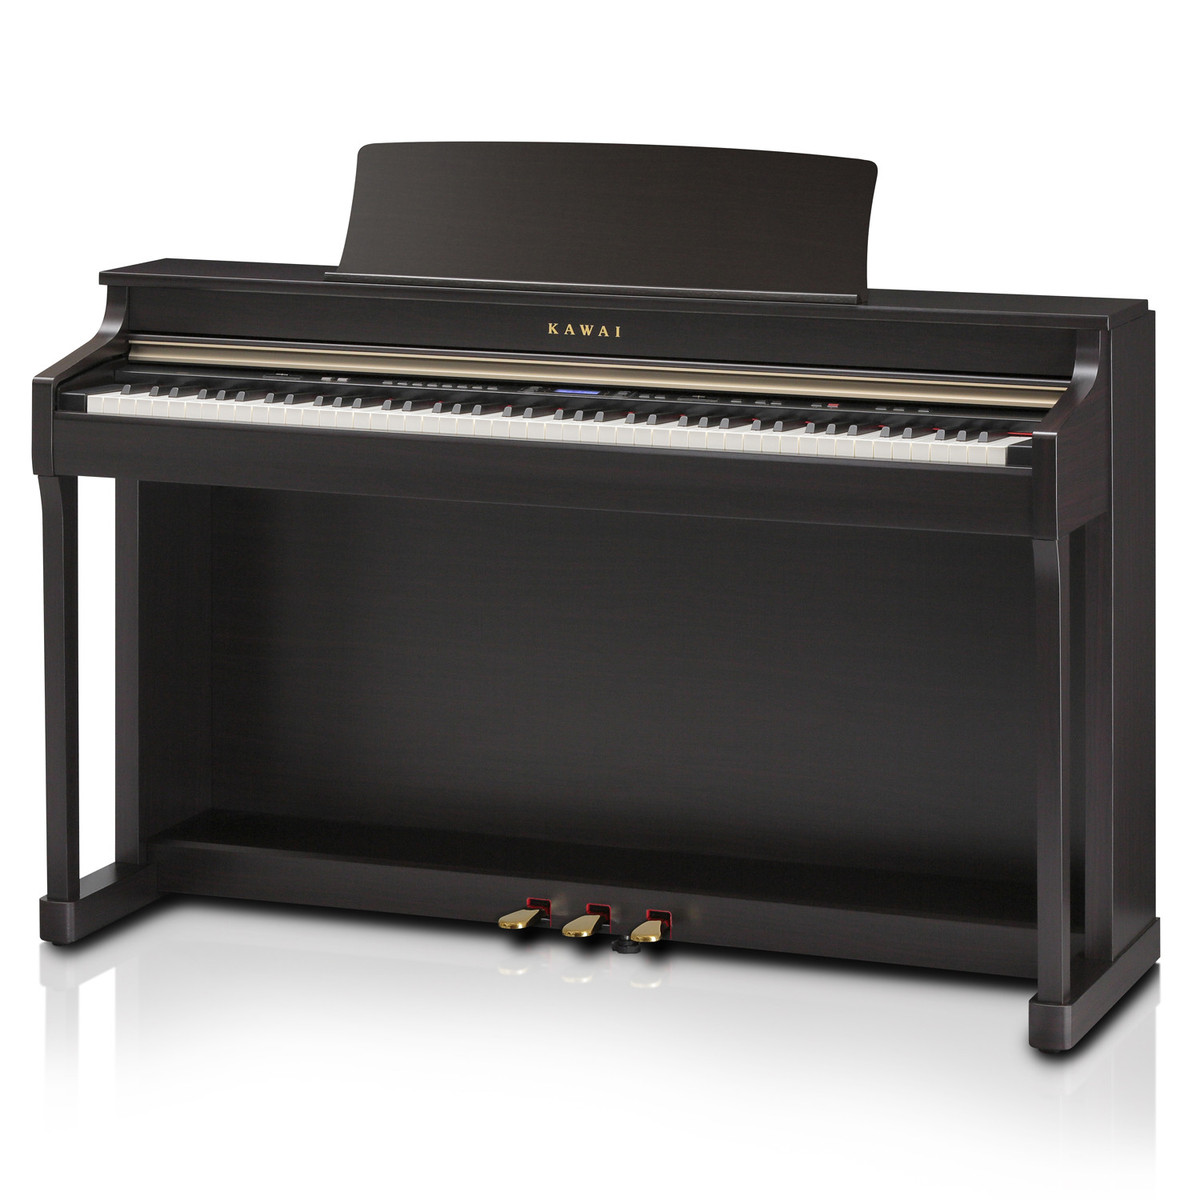 kawai cn35 digital piano premium rosewood at. Black Bedroom Furniture Sets. Home Design Ideas